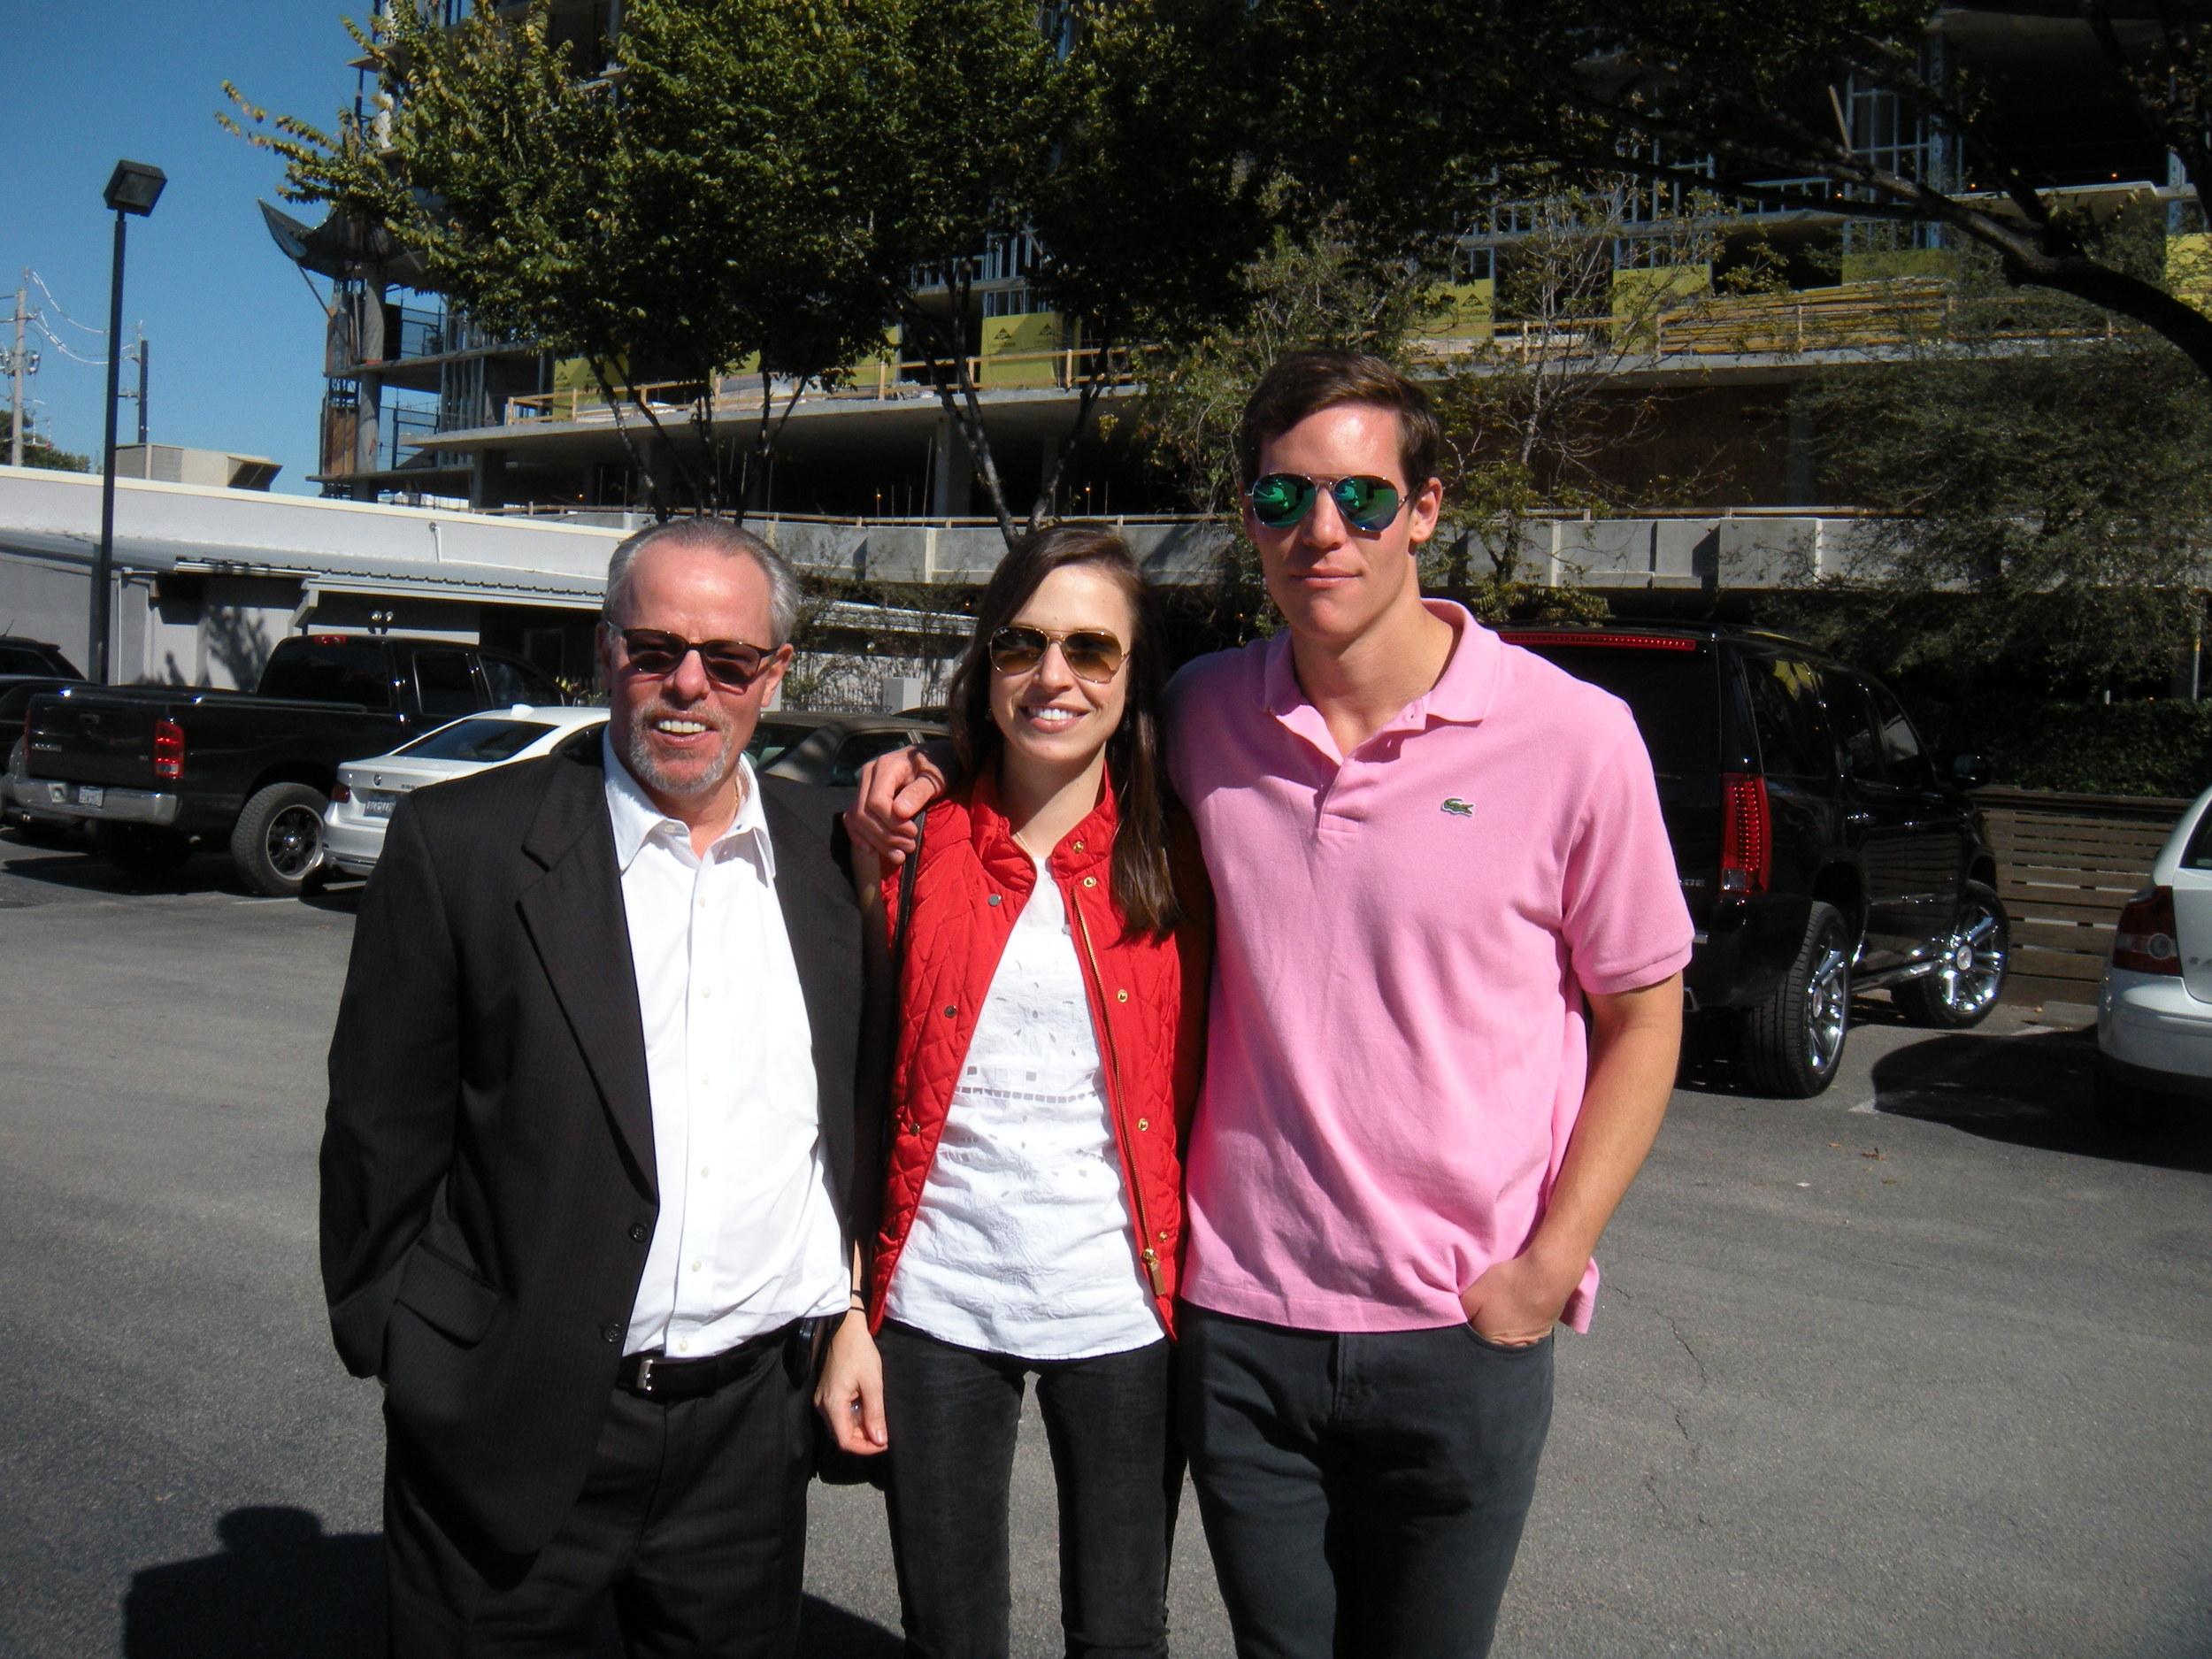 David, Anna, and Curtis.